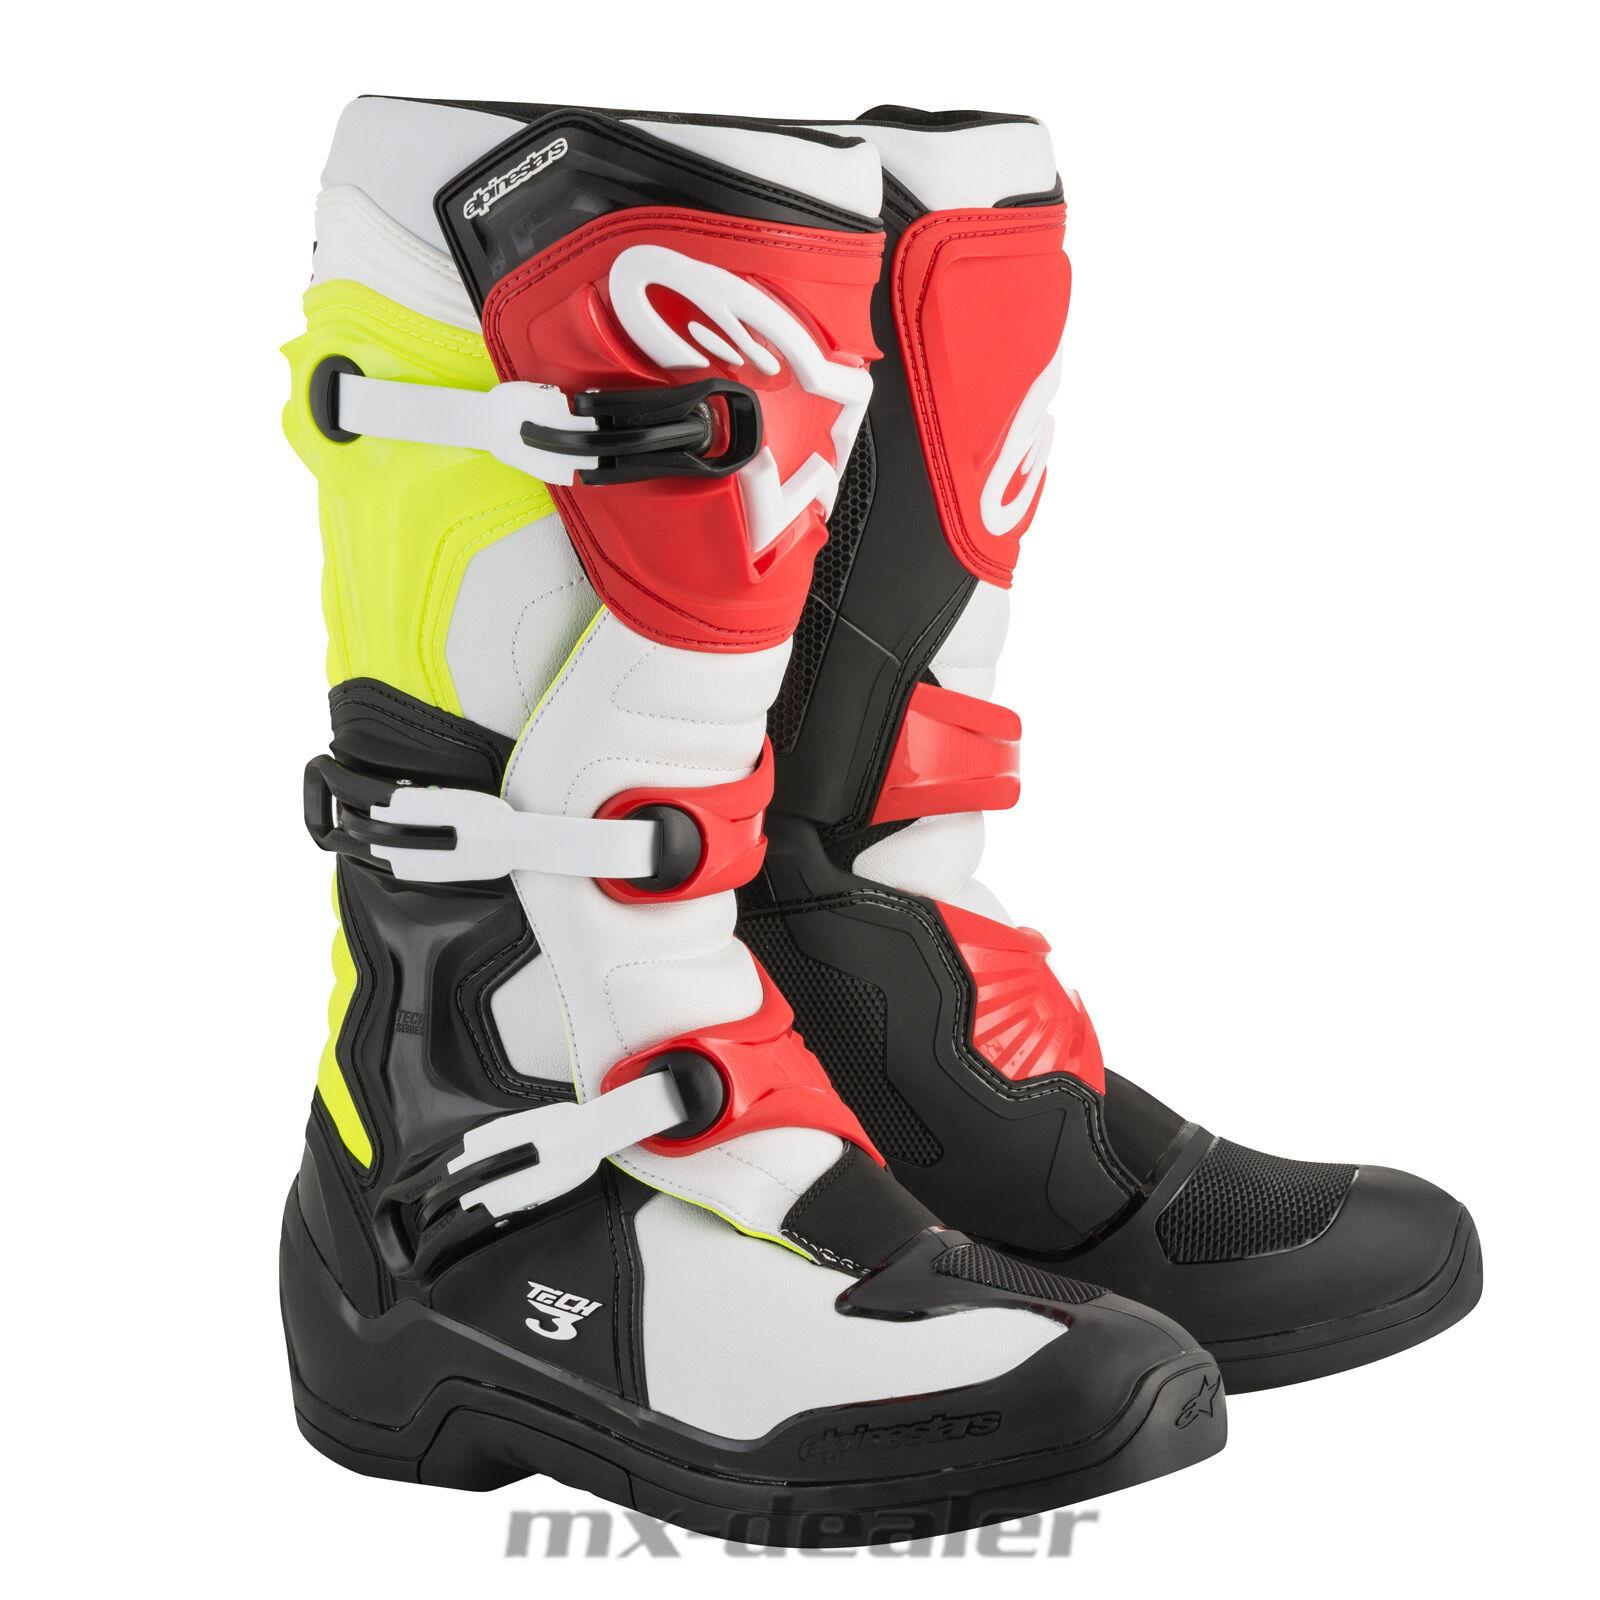 18 Alpinestars neuf TECH3 Technologie 3 botte noir jaune néon motocross enduro